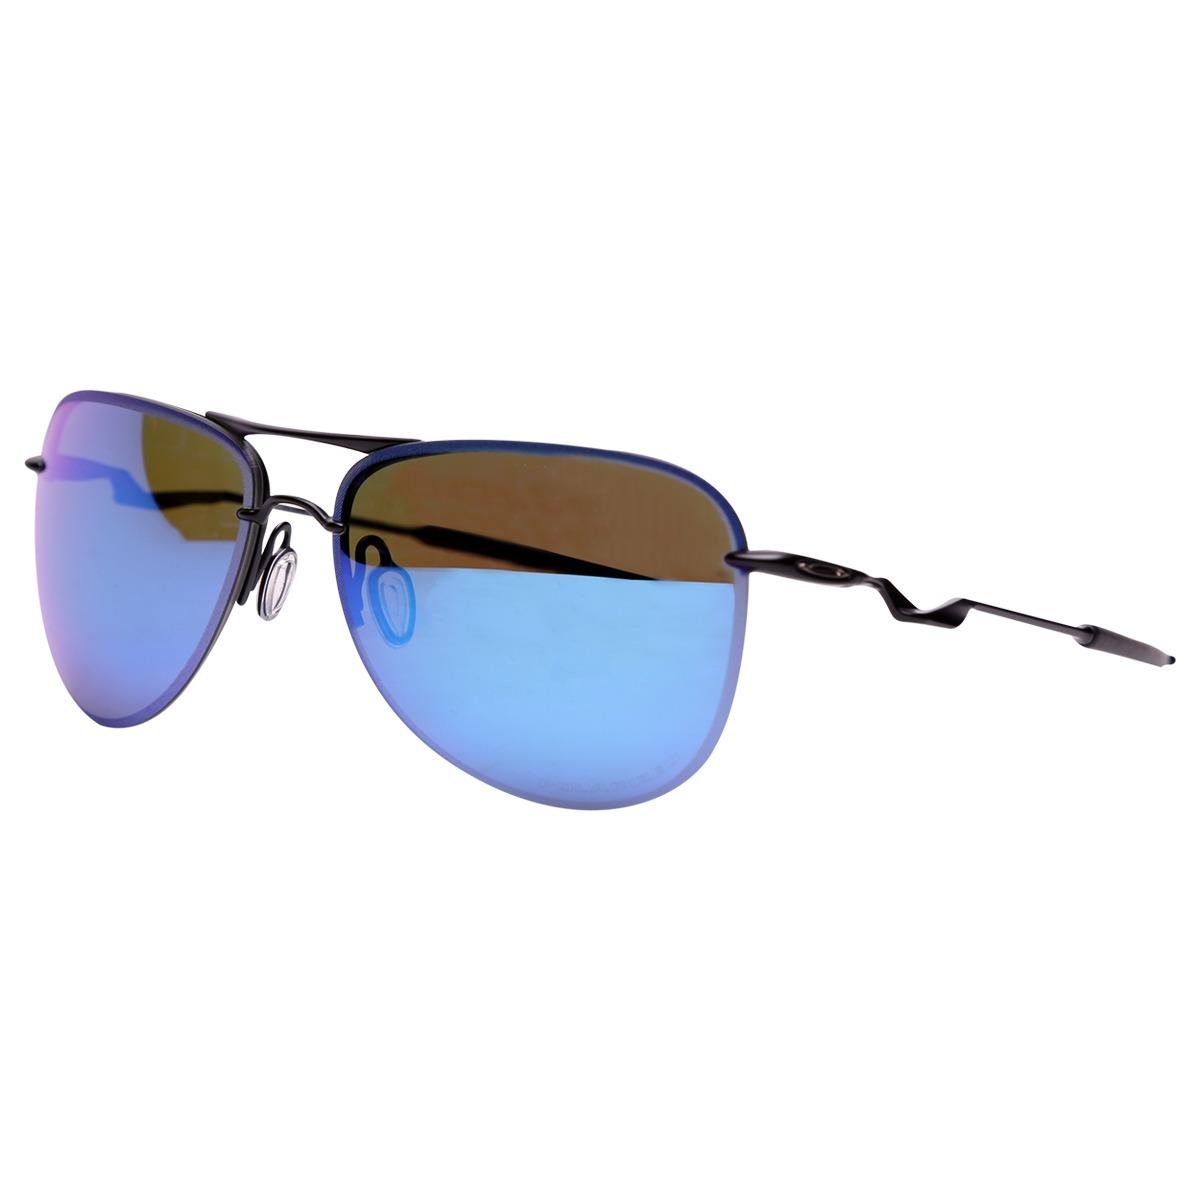 óculos oakley aviador tailpin crosshair polarizado titanium. Carregando  zoom. fabe229557